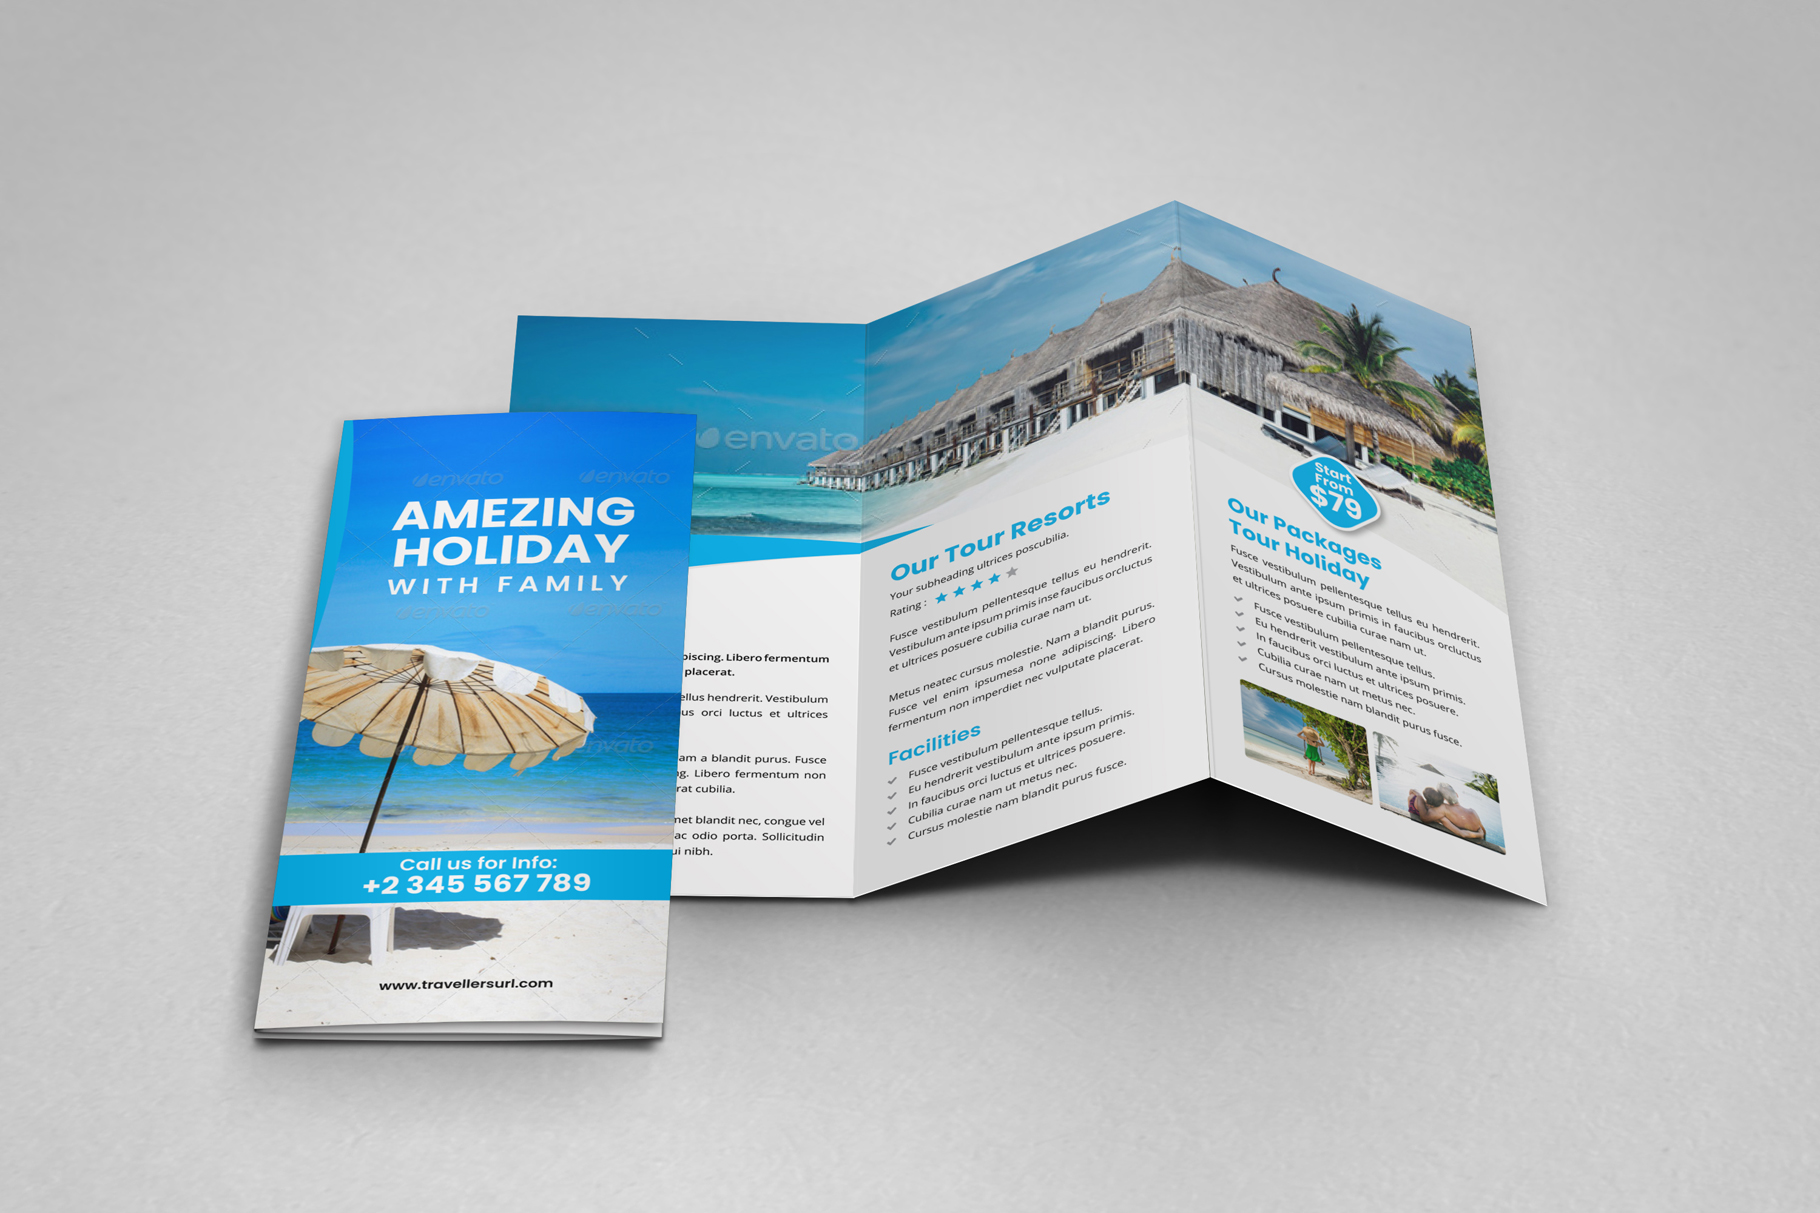 Travel Resort Trifold Brochure v3 example image 10